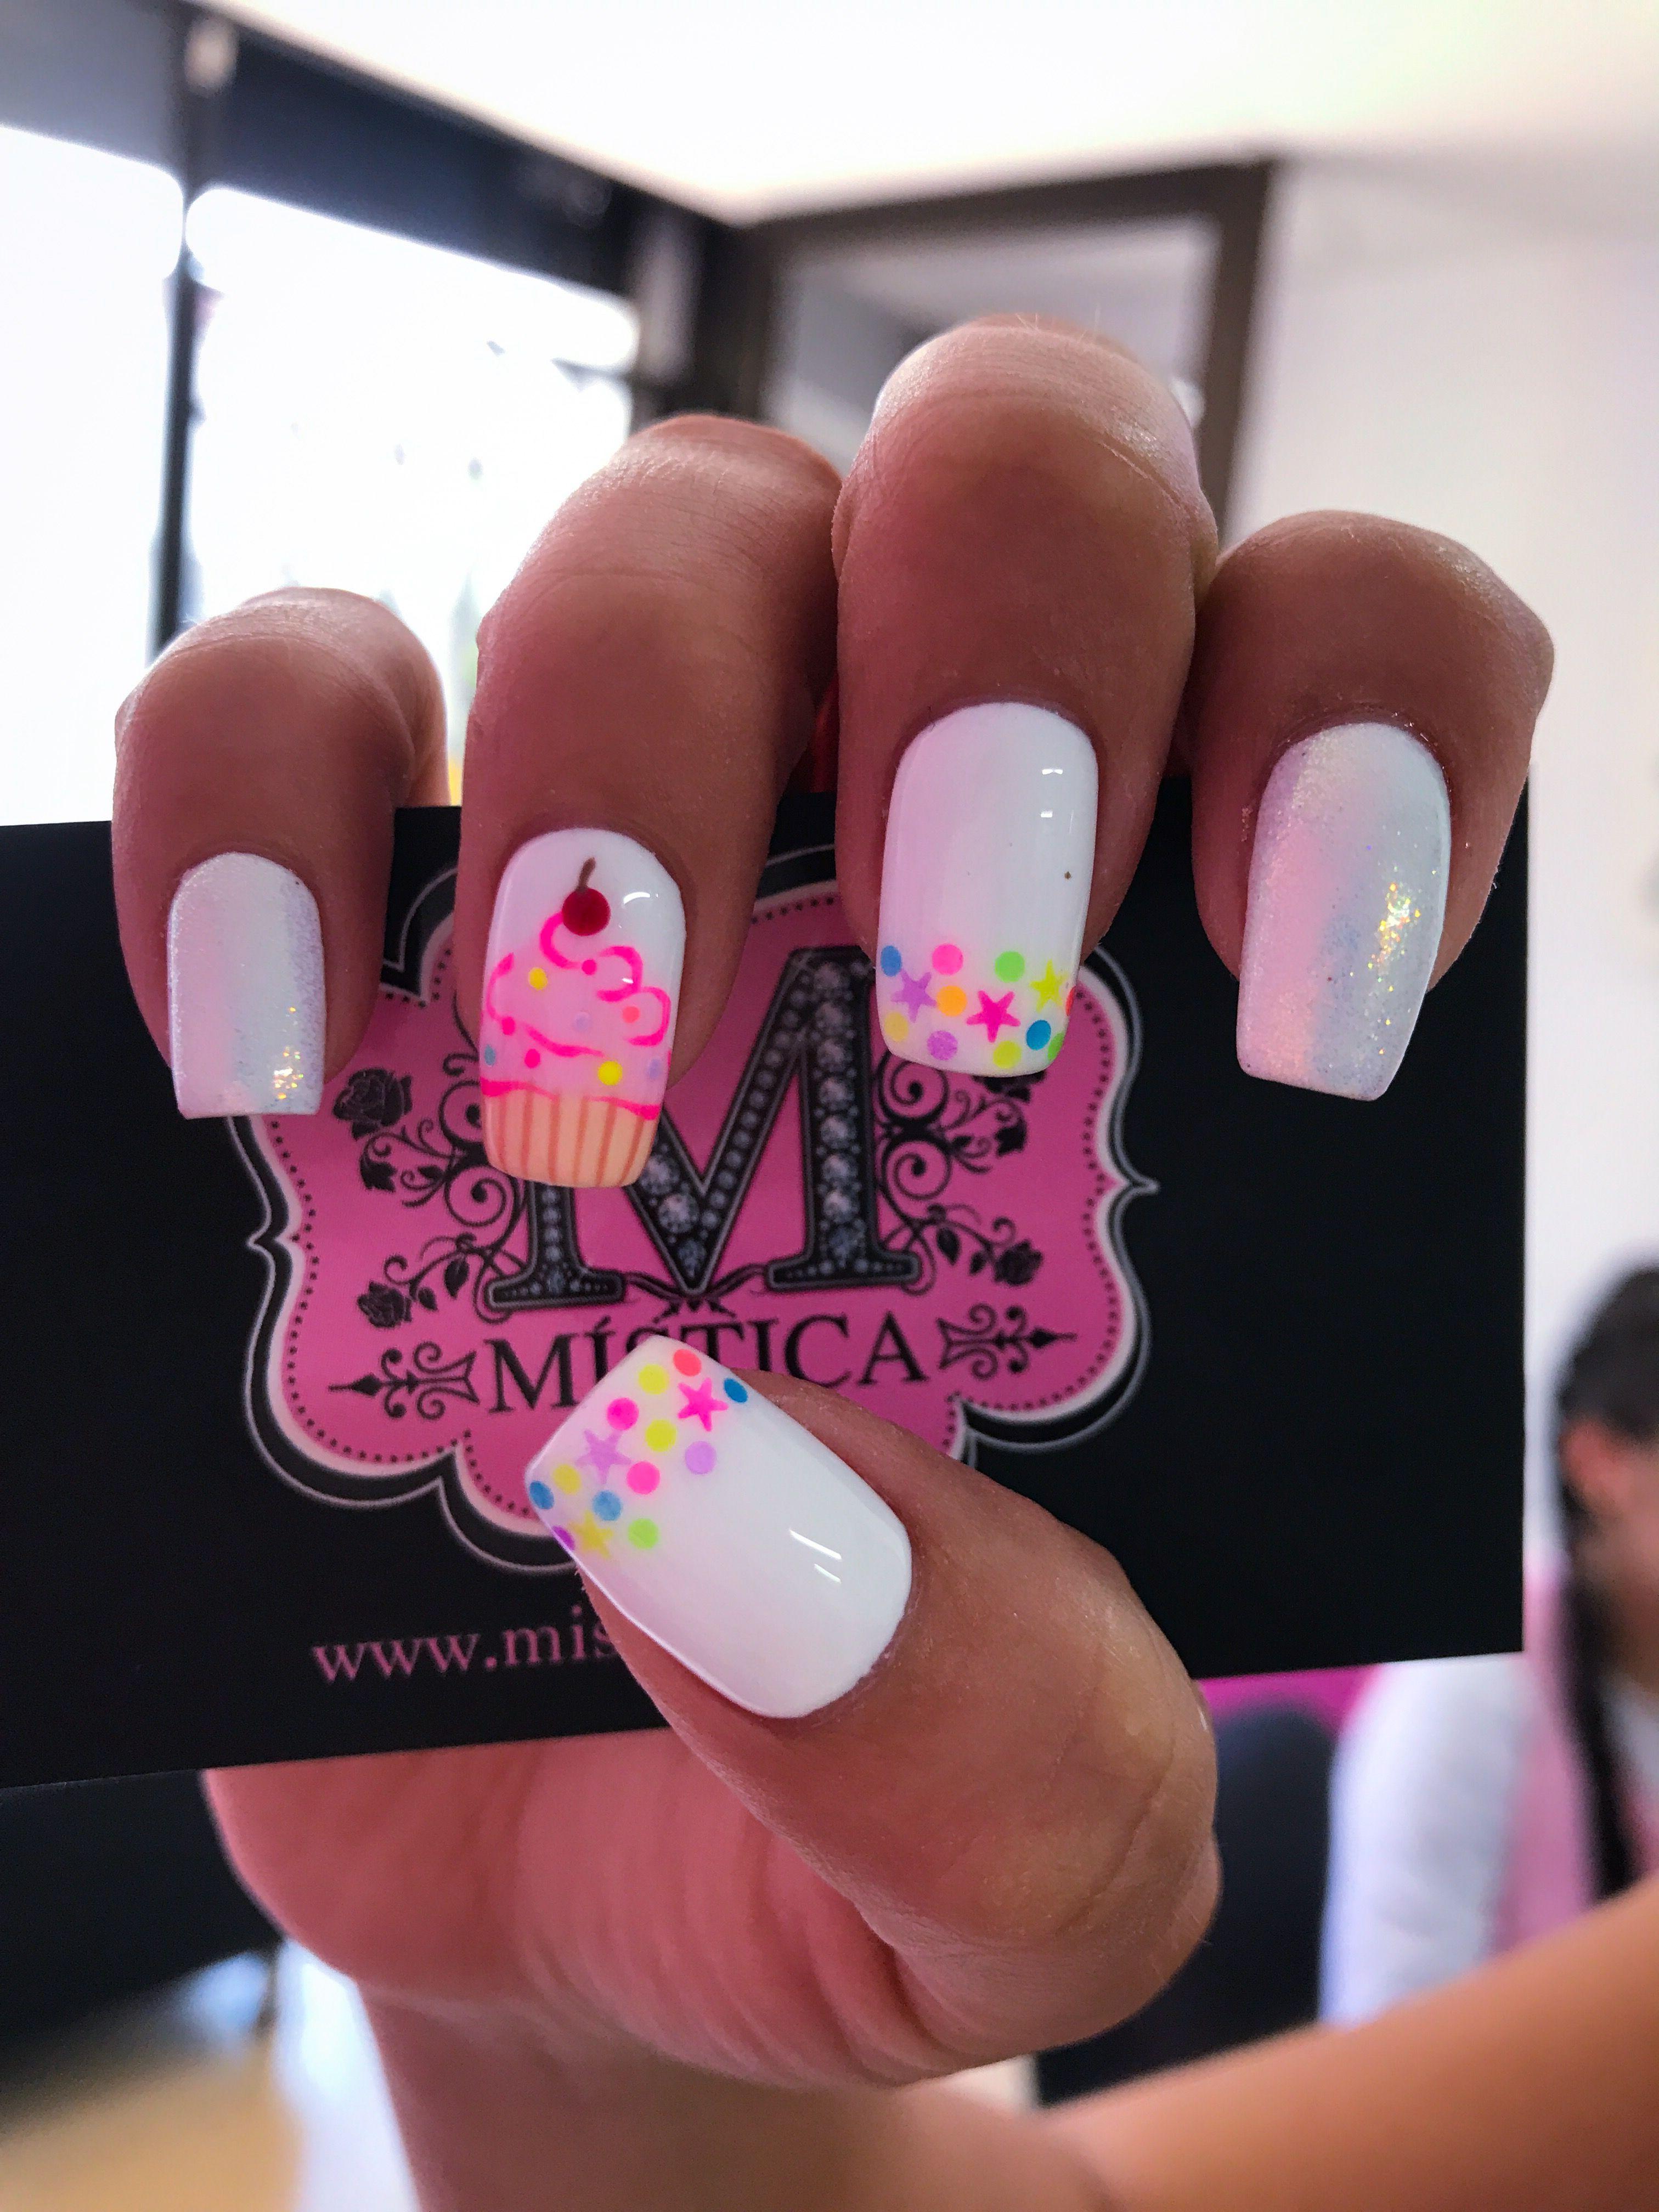 Uñas cupcakes | Mistica Nail Spa | Pinterest | Manicure and Toe nail ...